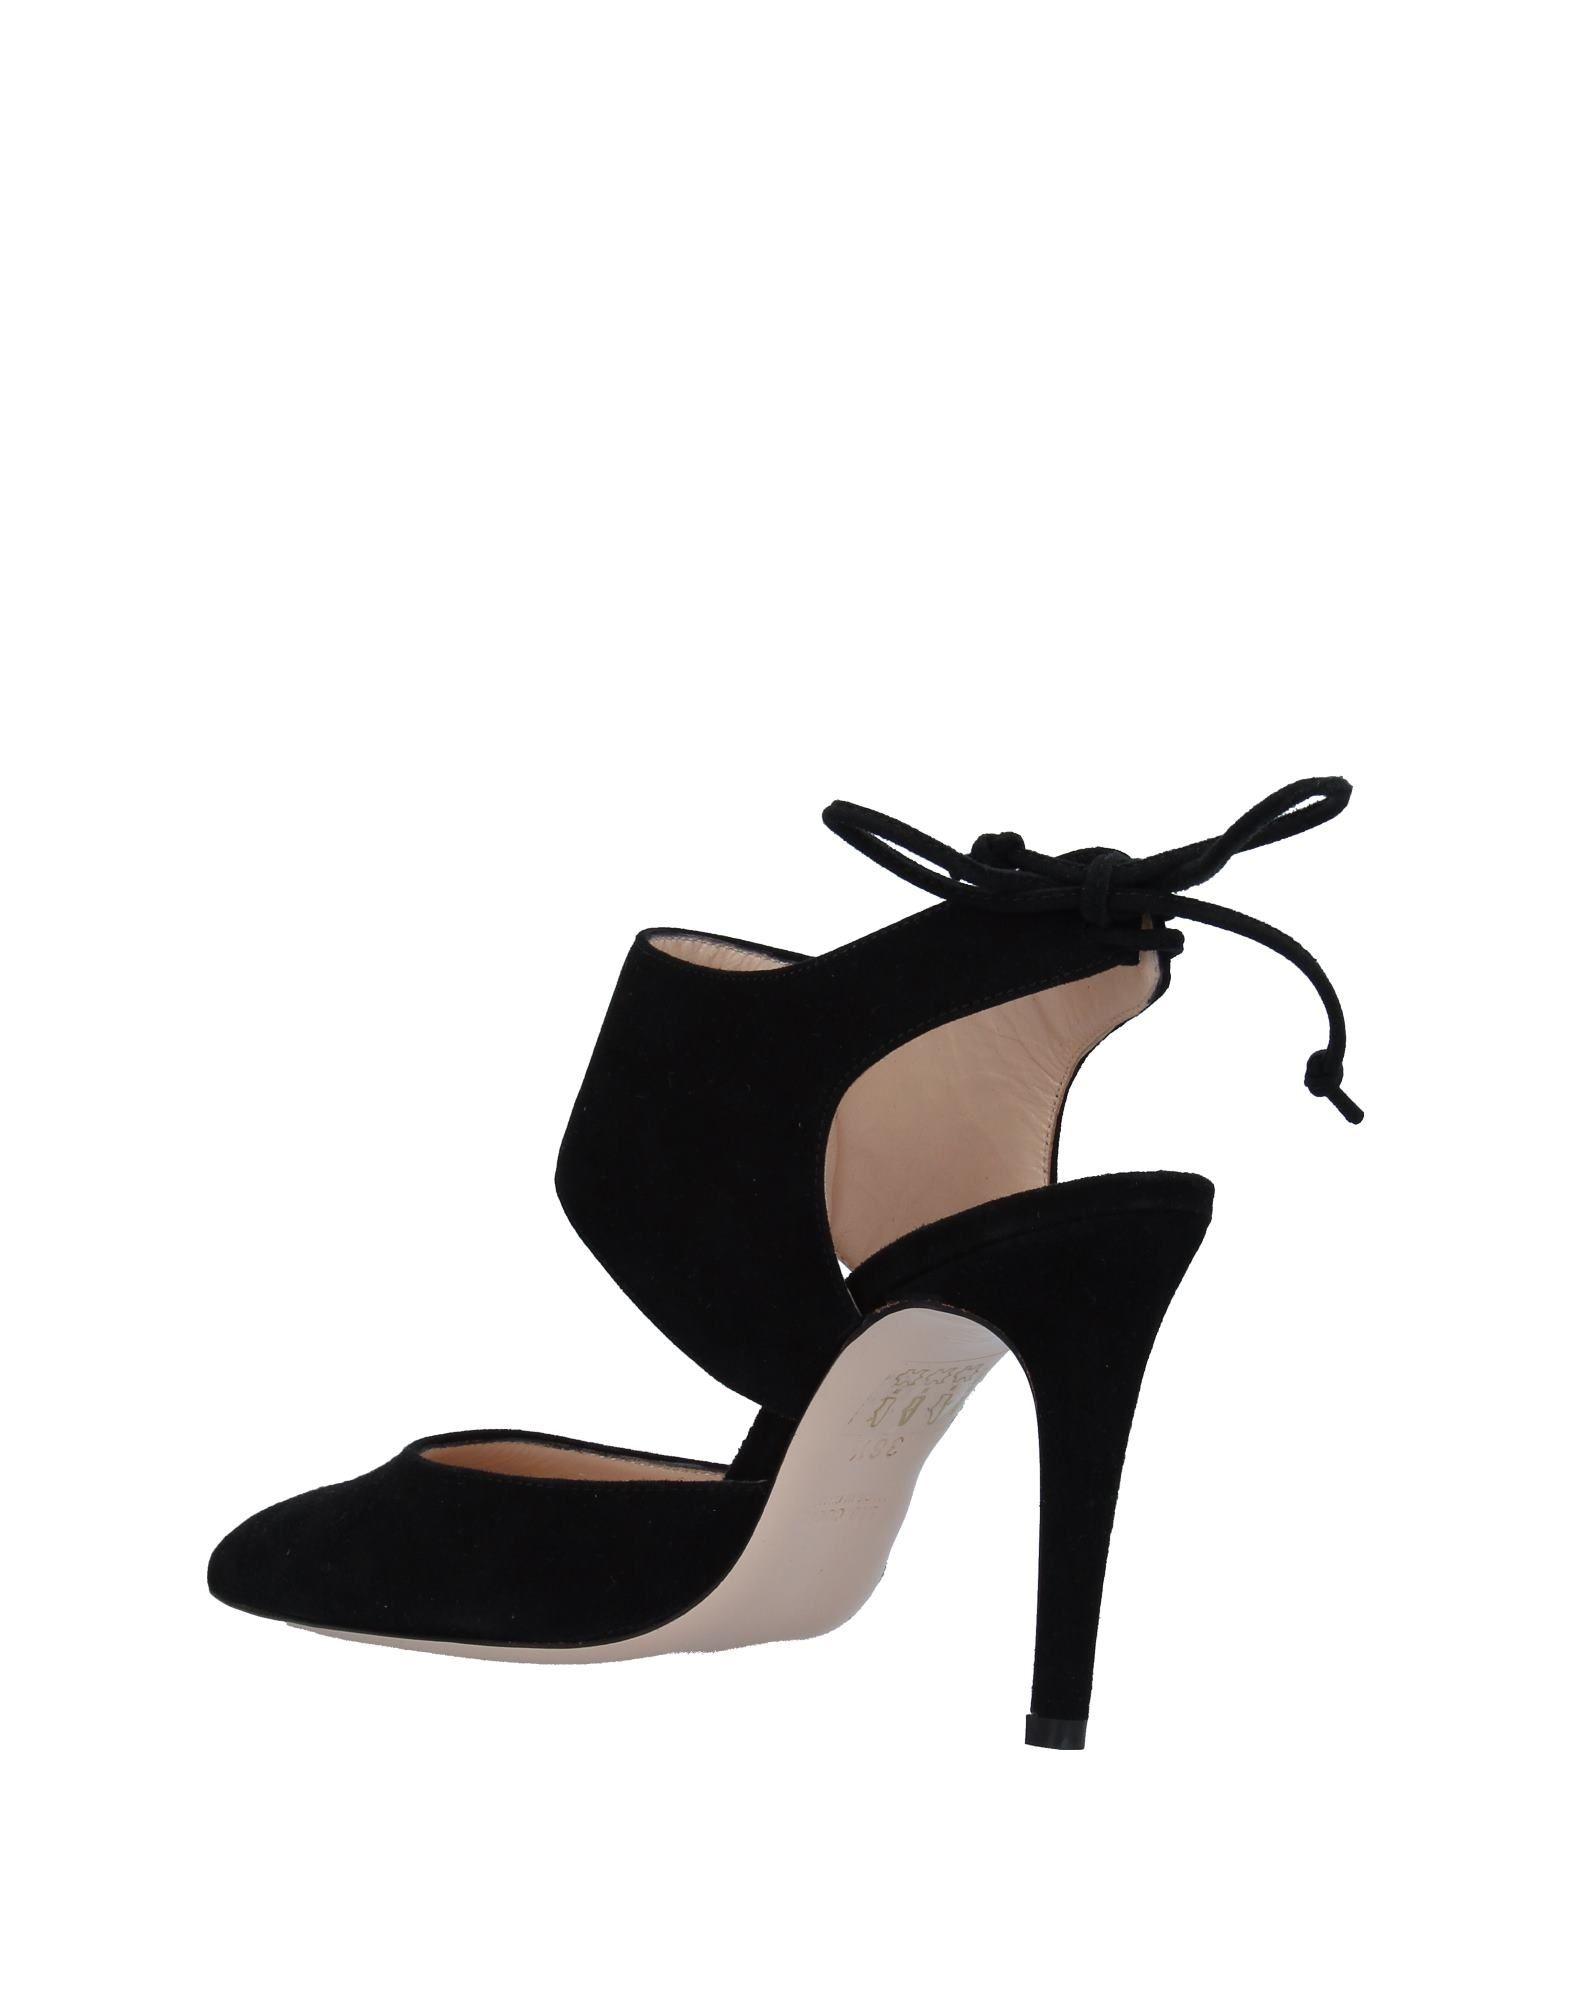 Festa 11372624GB Milano Pumps Damen  11372624GB Festa Gute Qualität beliebte Schuhe 85e0fa